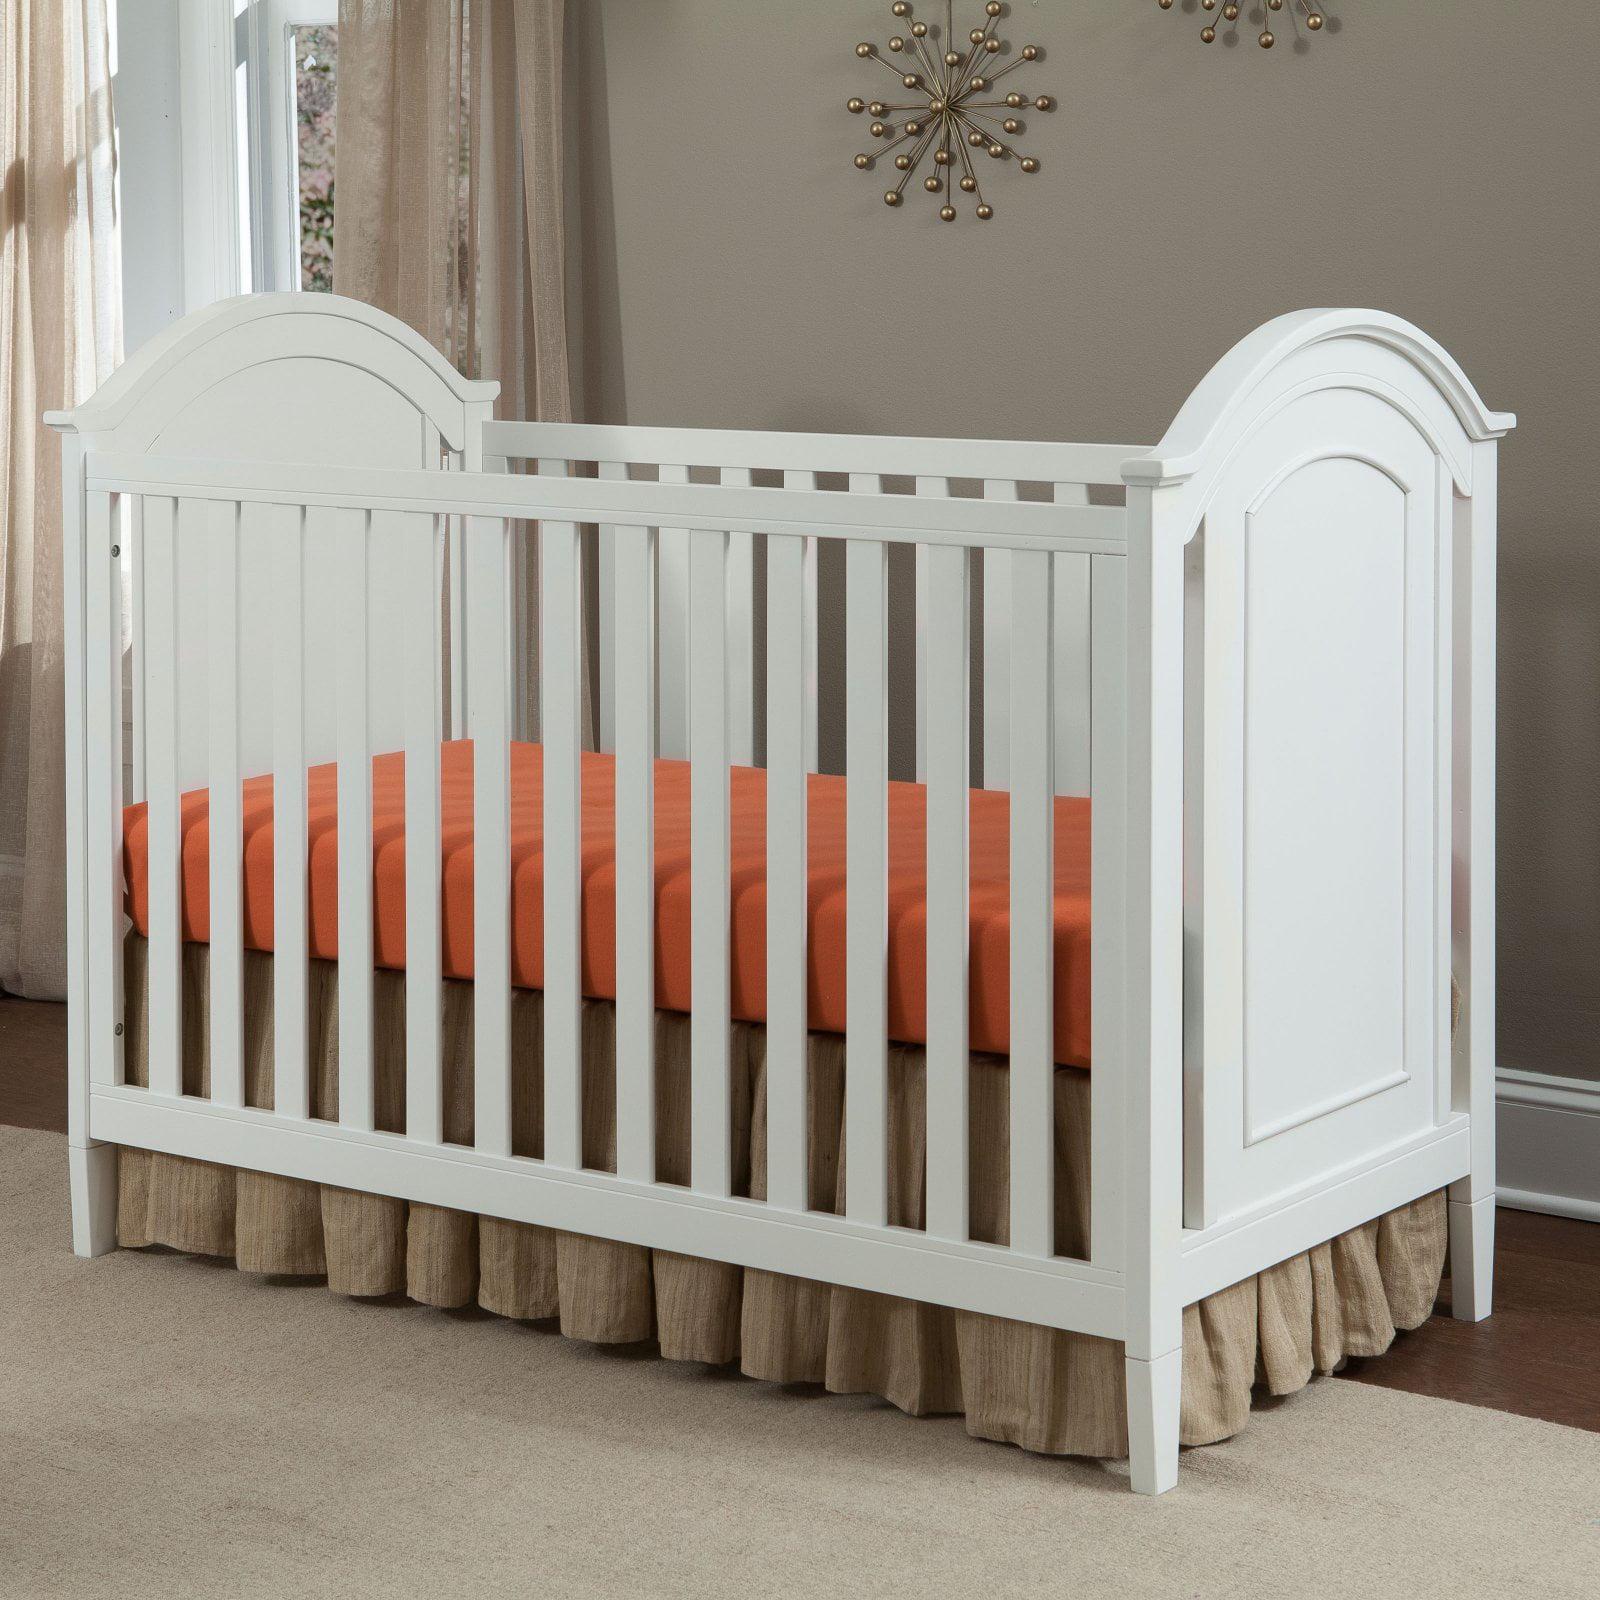 Westwood Design Imagio Baby Harper Cottage Crib Detailed Panels